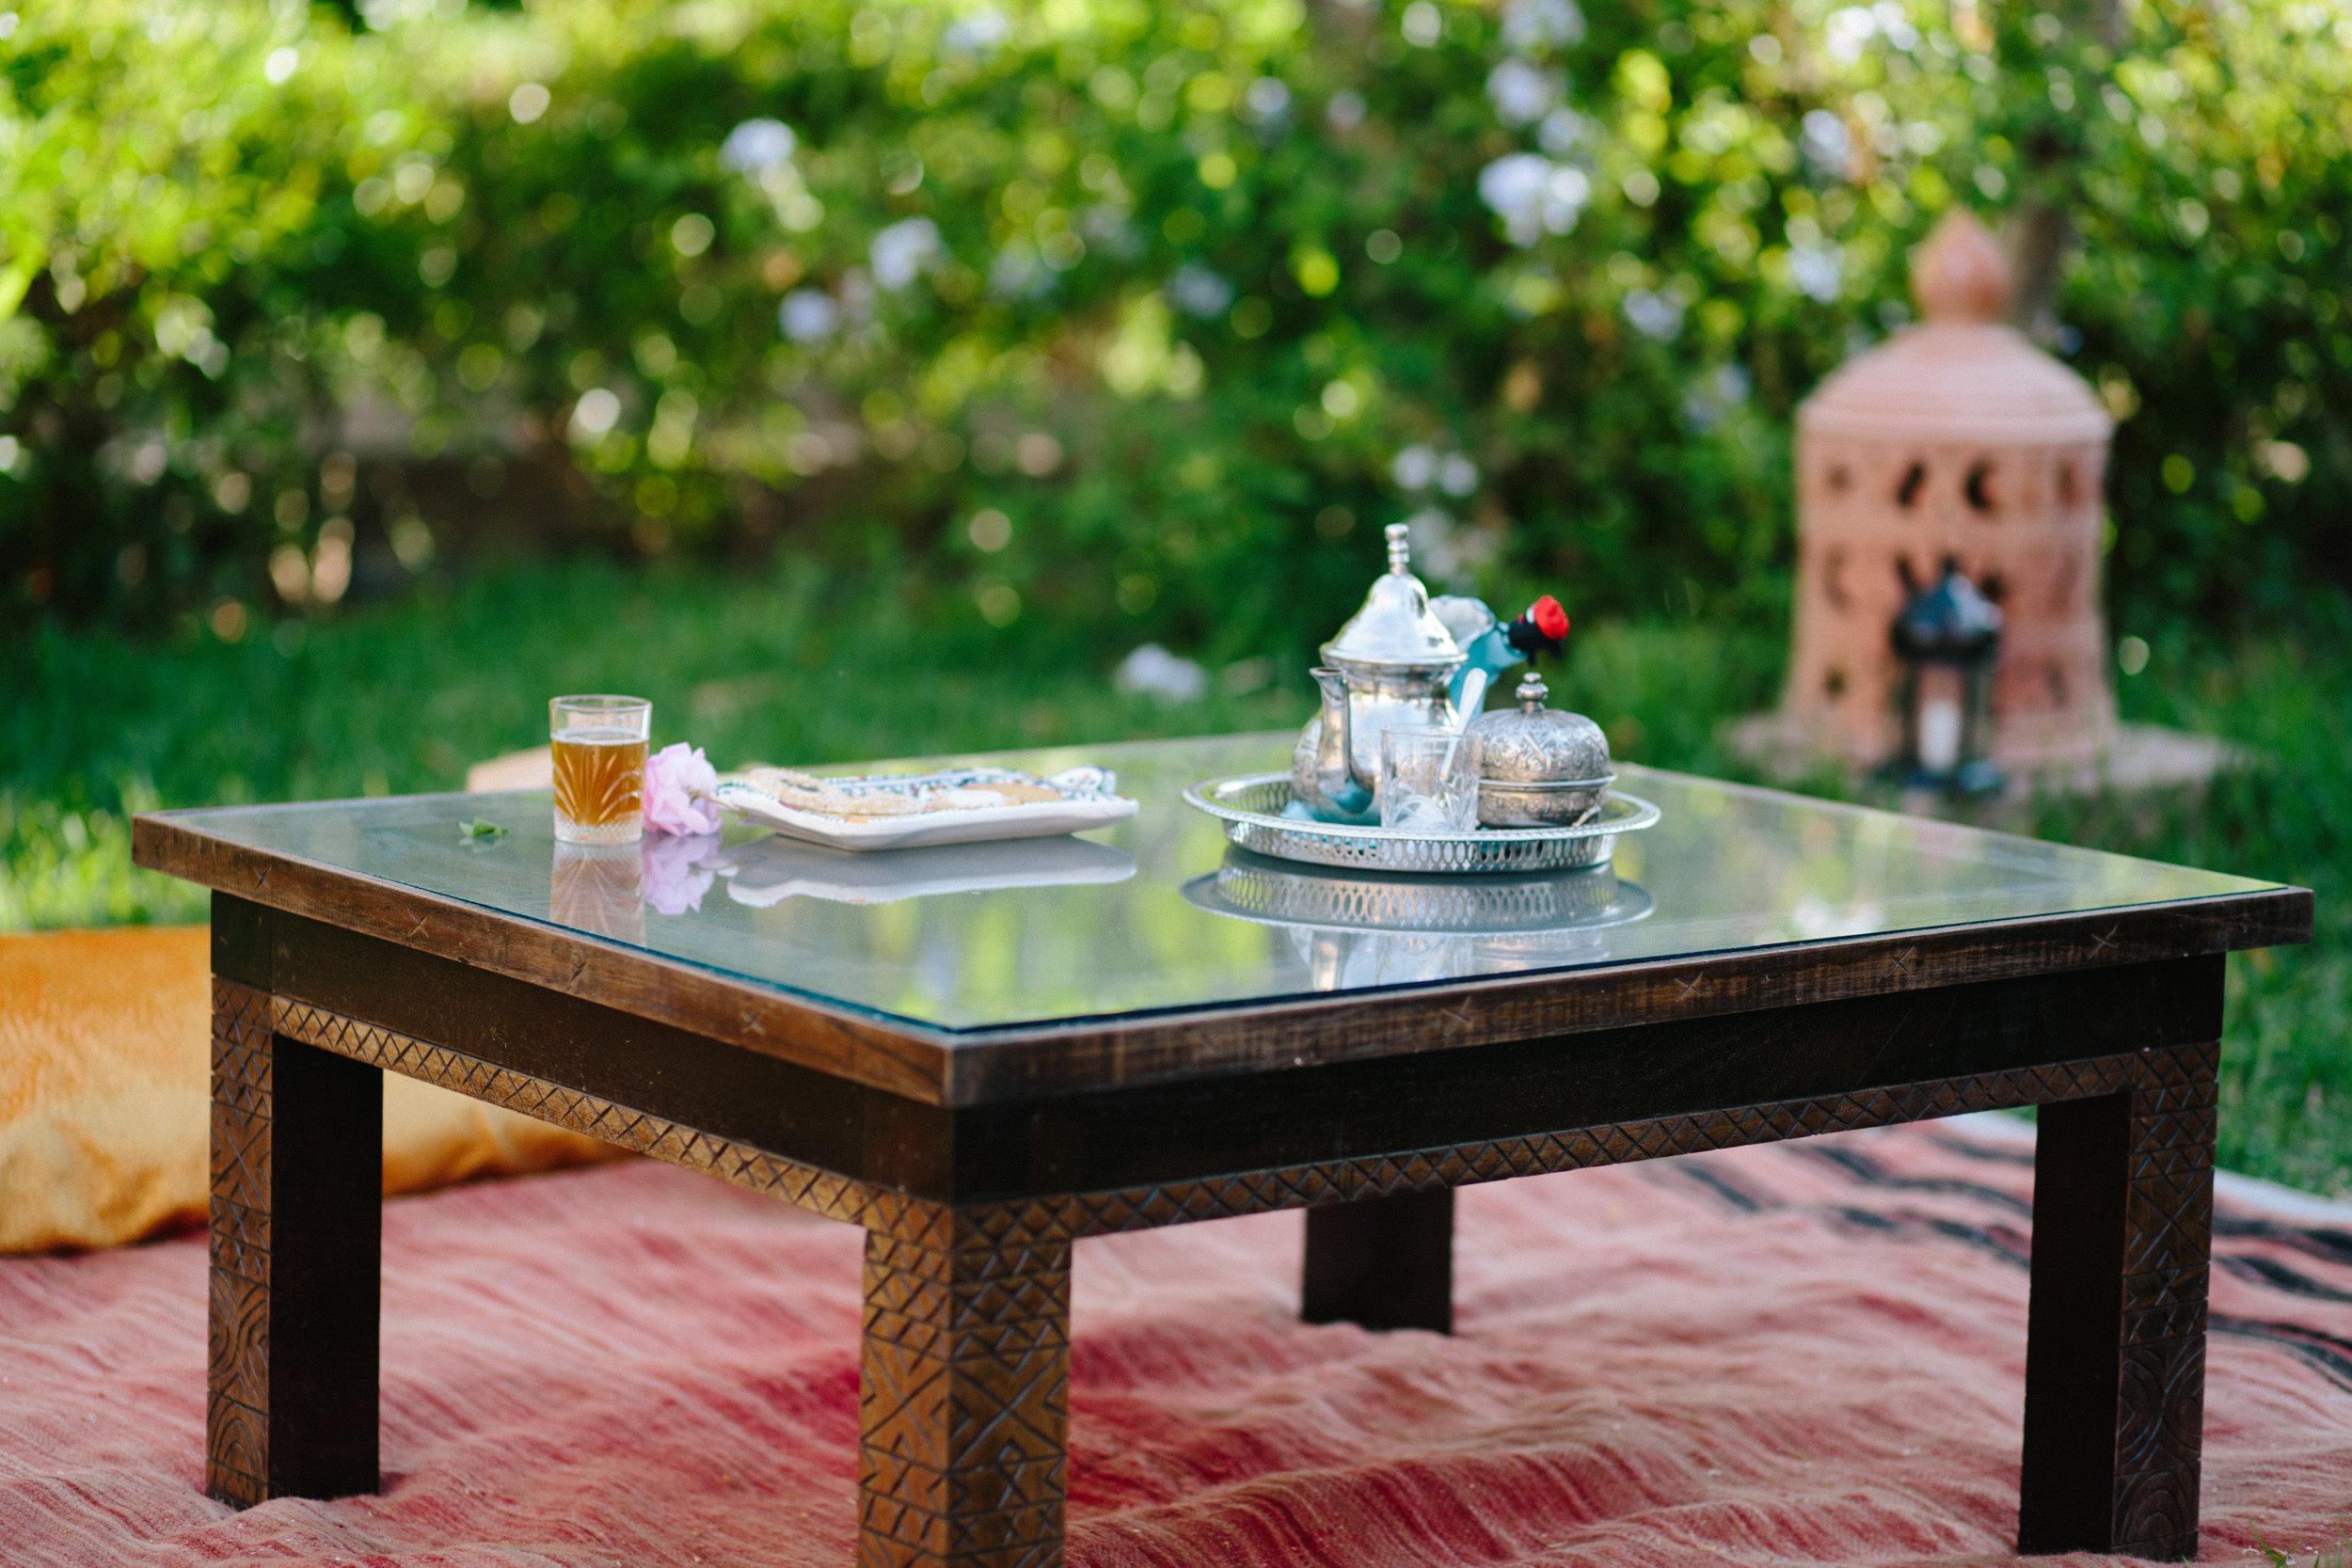 morocco-morocco travel-visit morocco-travel-travel photography-travel photographer-alina mendoza-alina mendoza photography-64.jpg